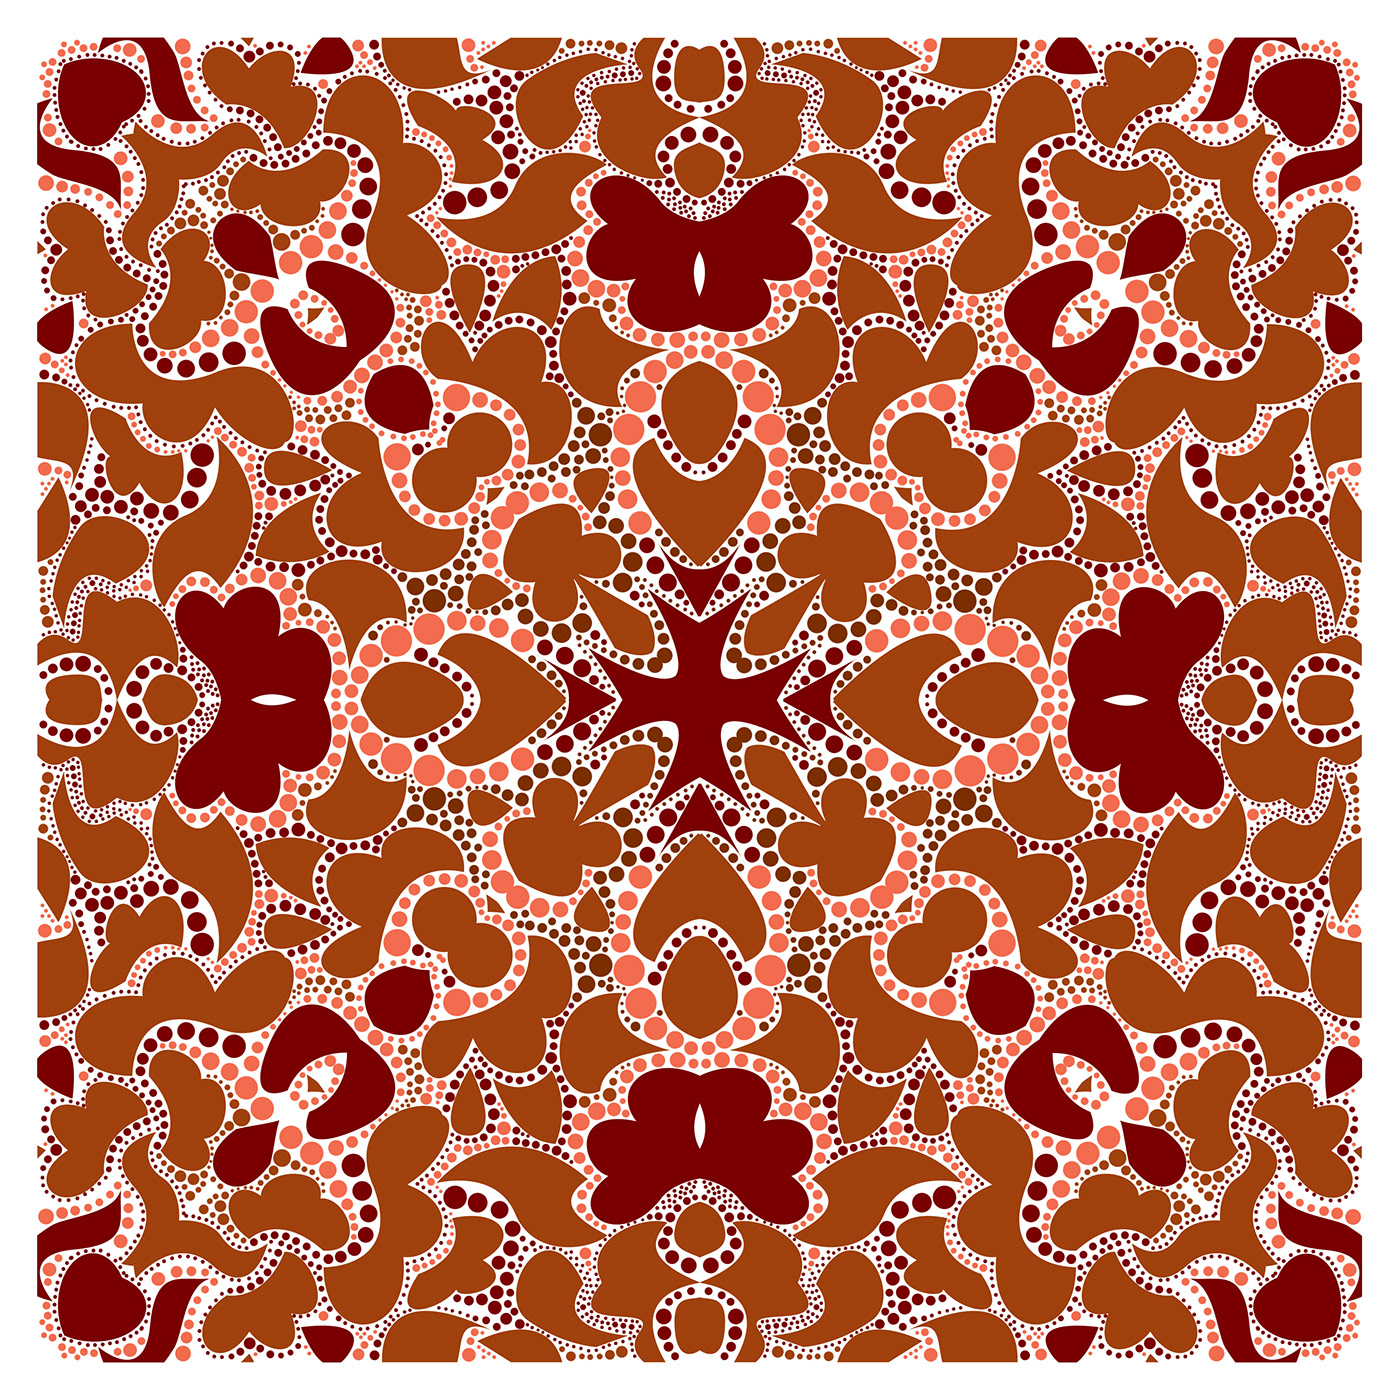 surface design textile fashion prints sparklina textile pattern design scarf design Dotted Art